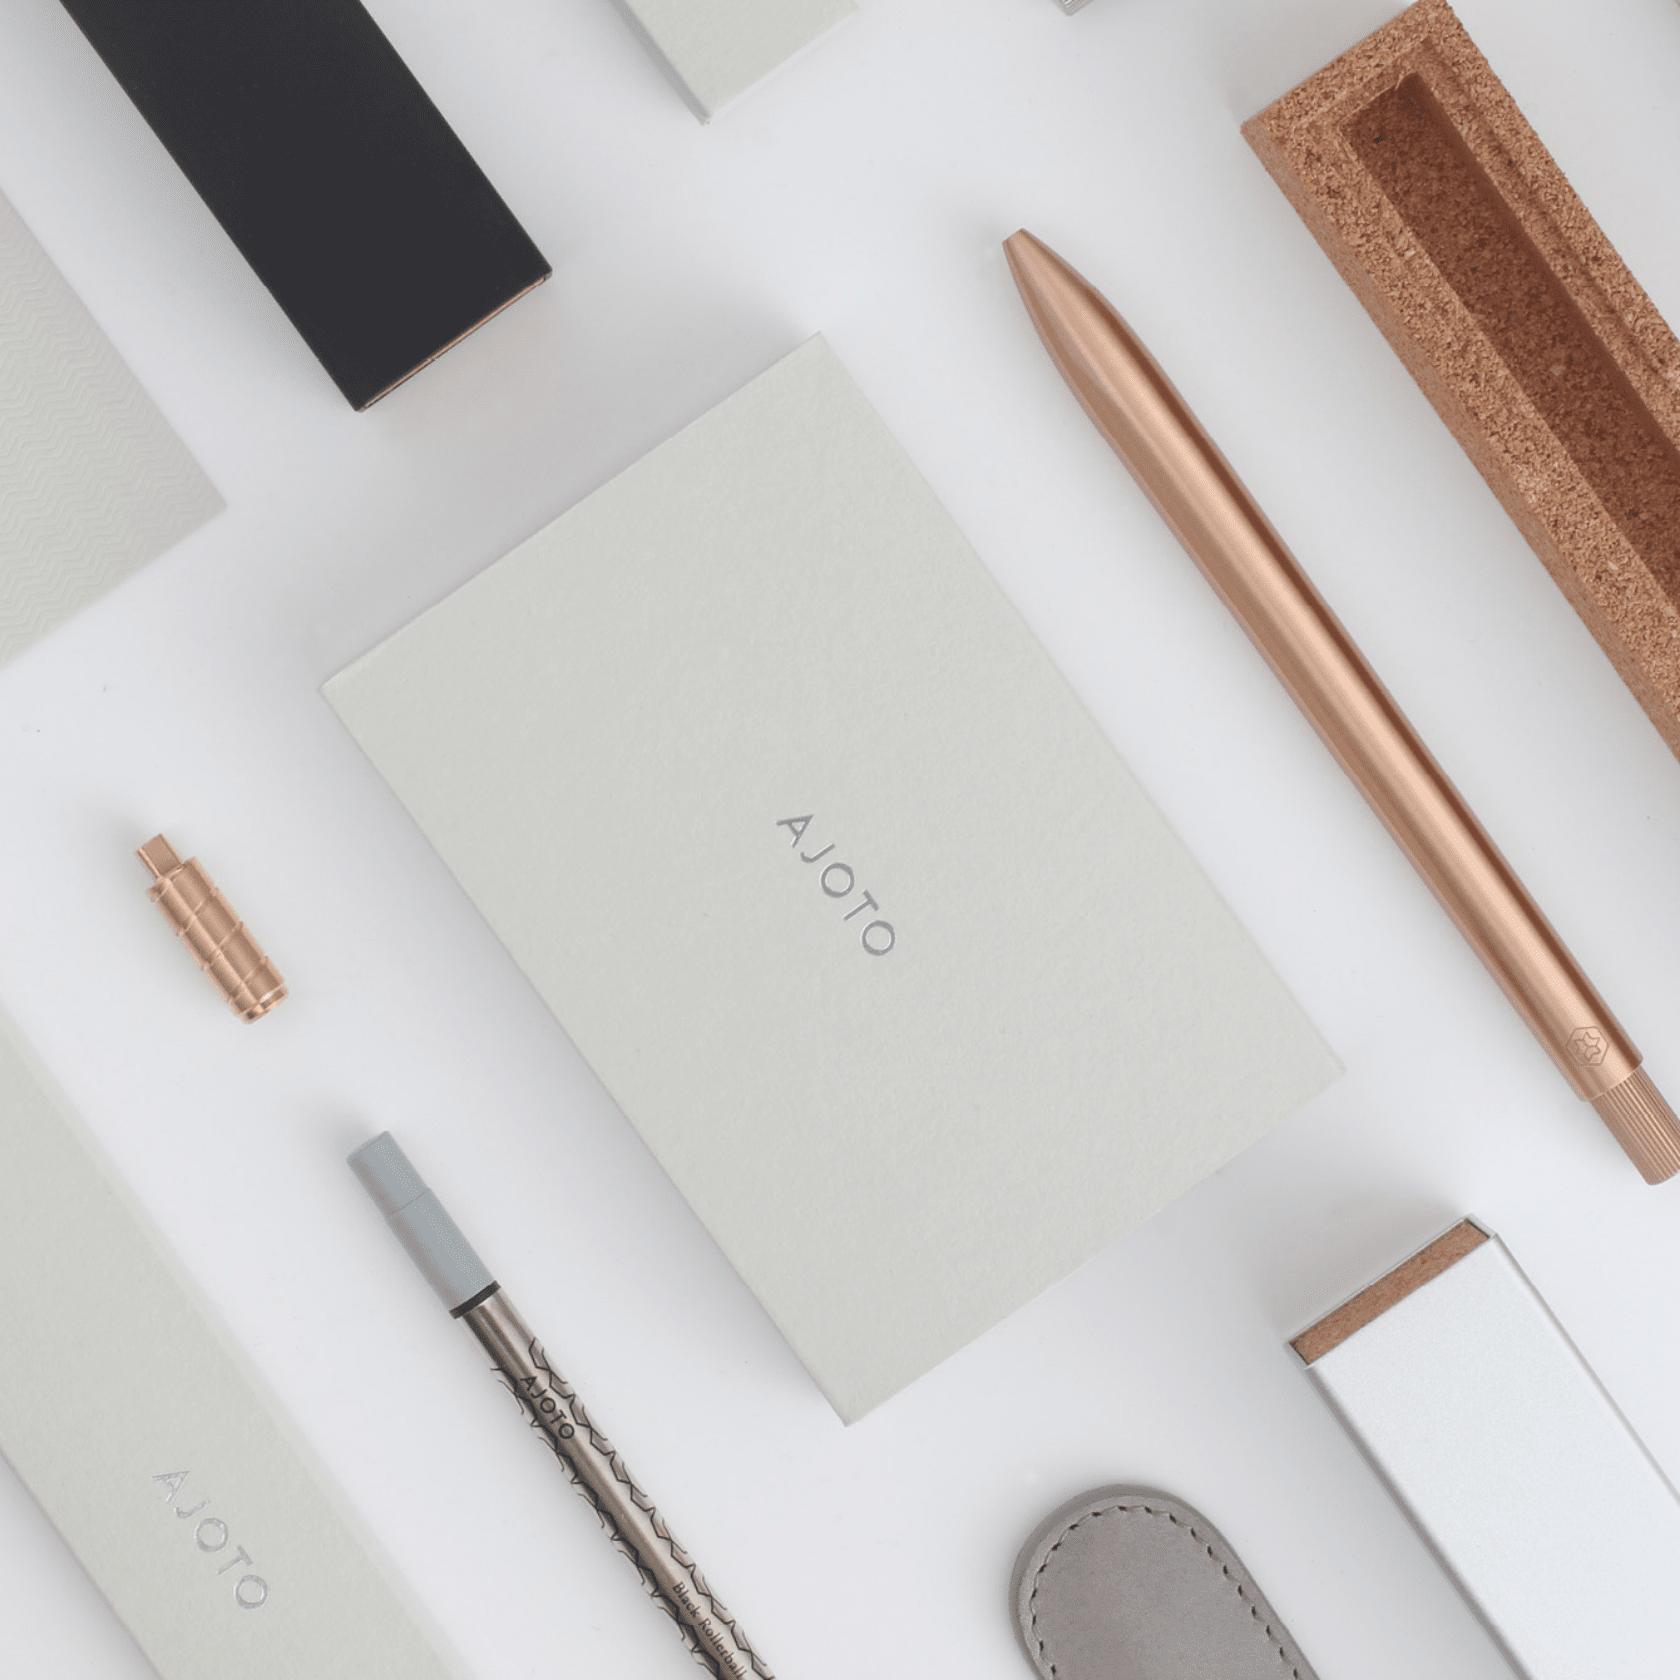 Ajoto - e-commerce website design and development